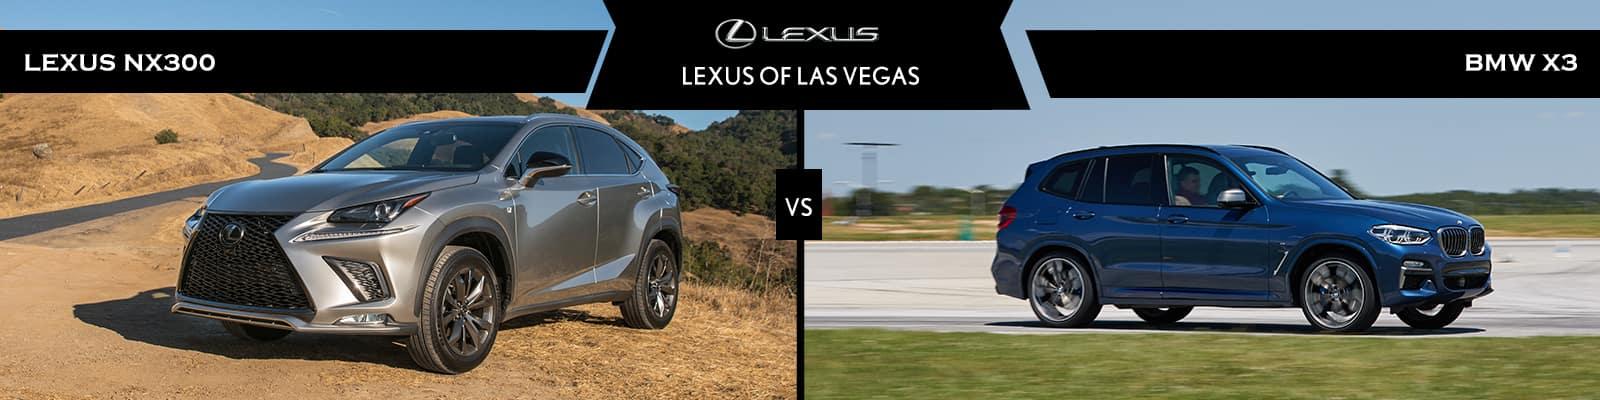 Lexus NX 300 vs BMW X3